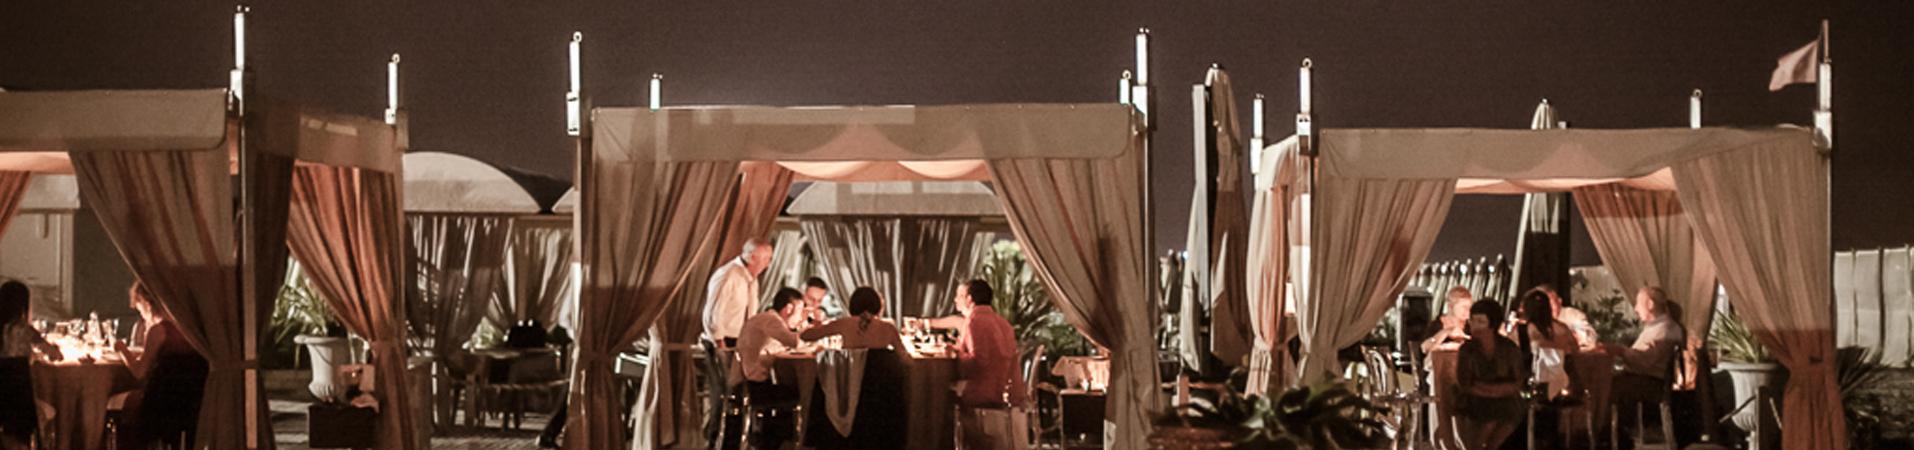 wedding_planner_adriatic_beach_italy